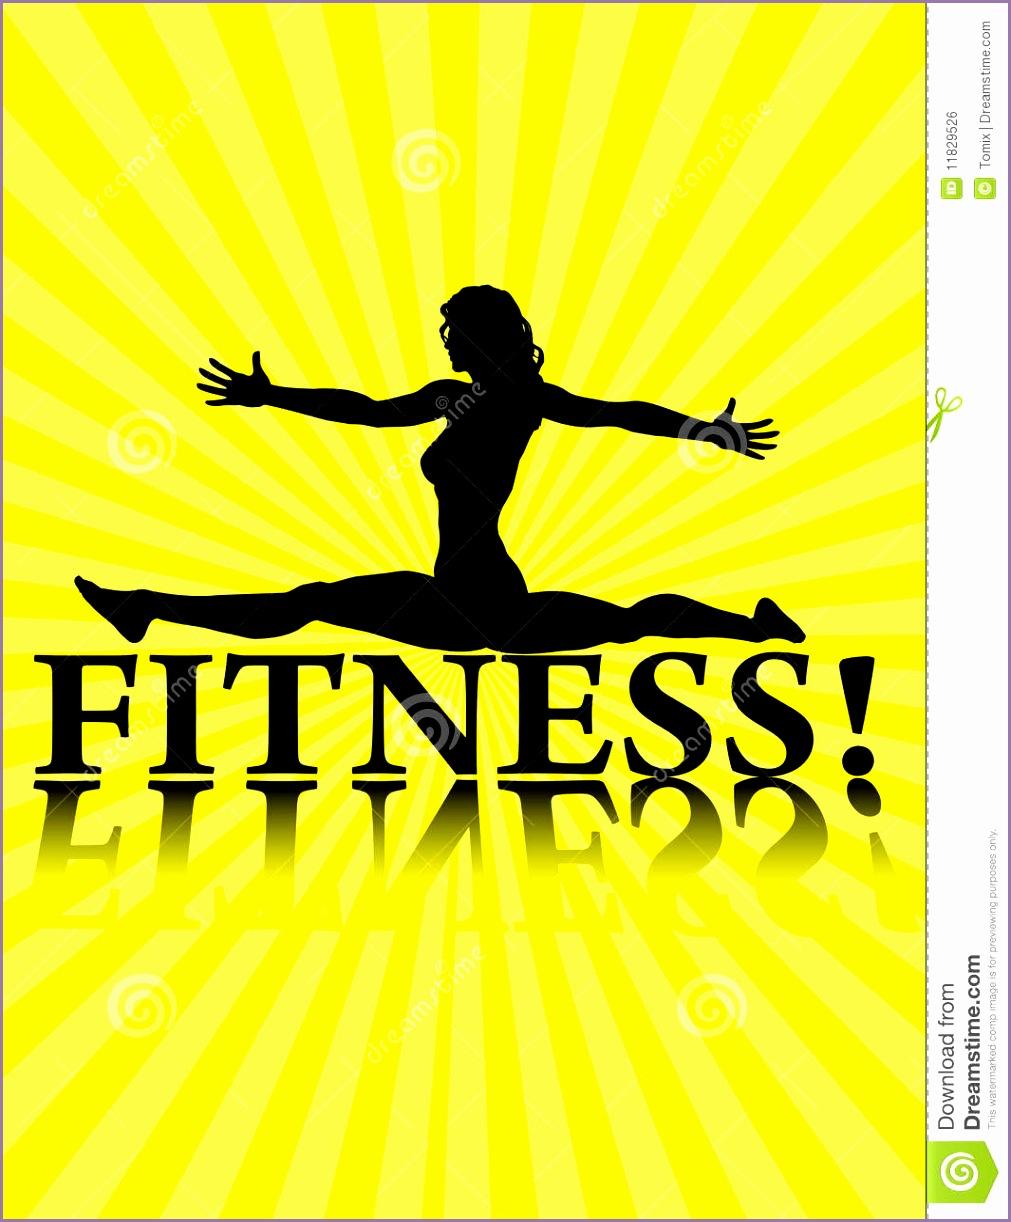 royalty free stock image fitness background image